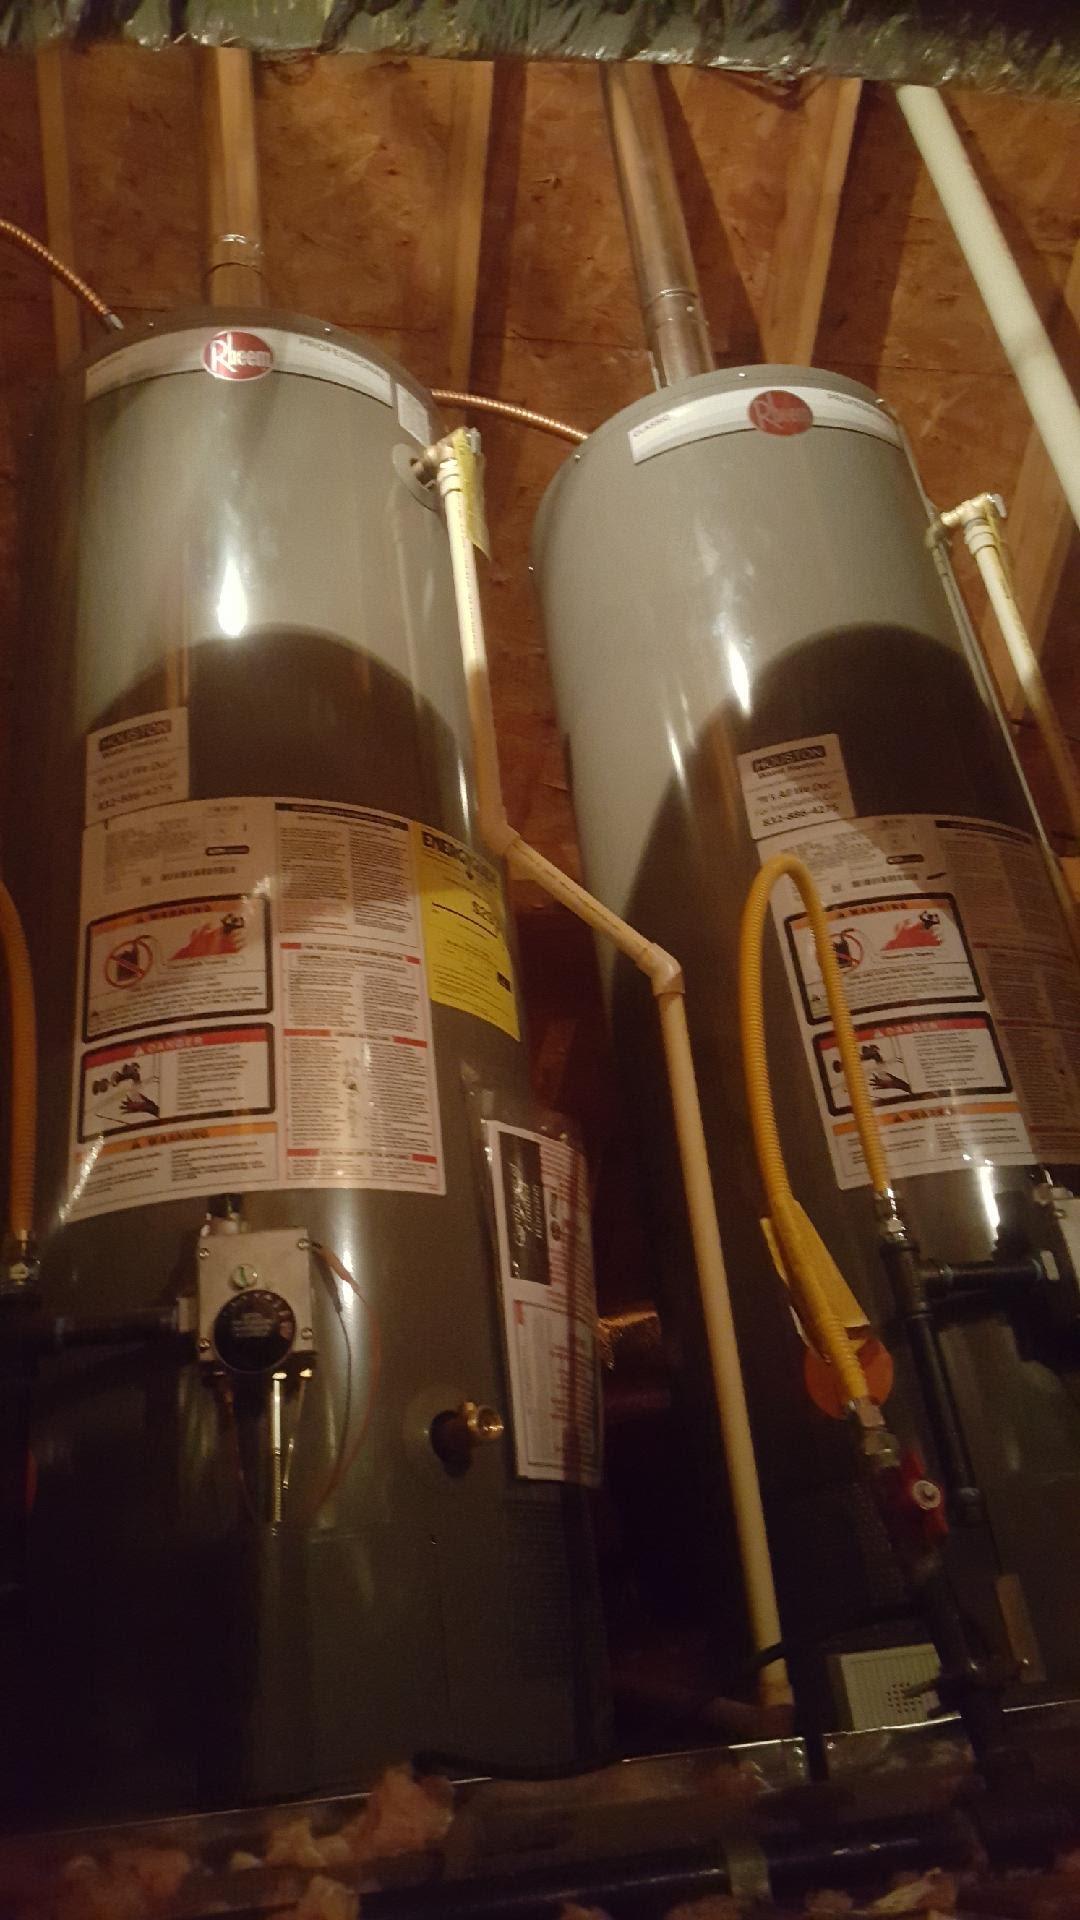 Katy Water Heaters image 63